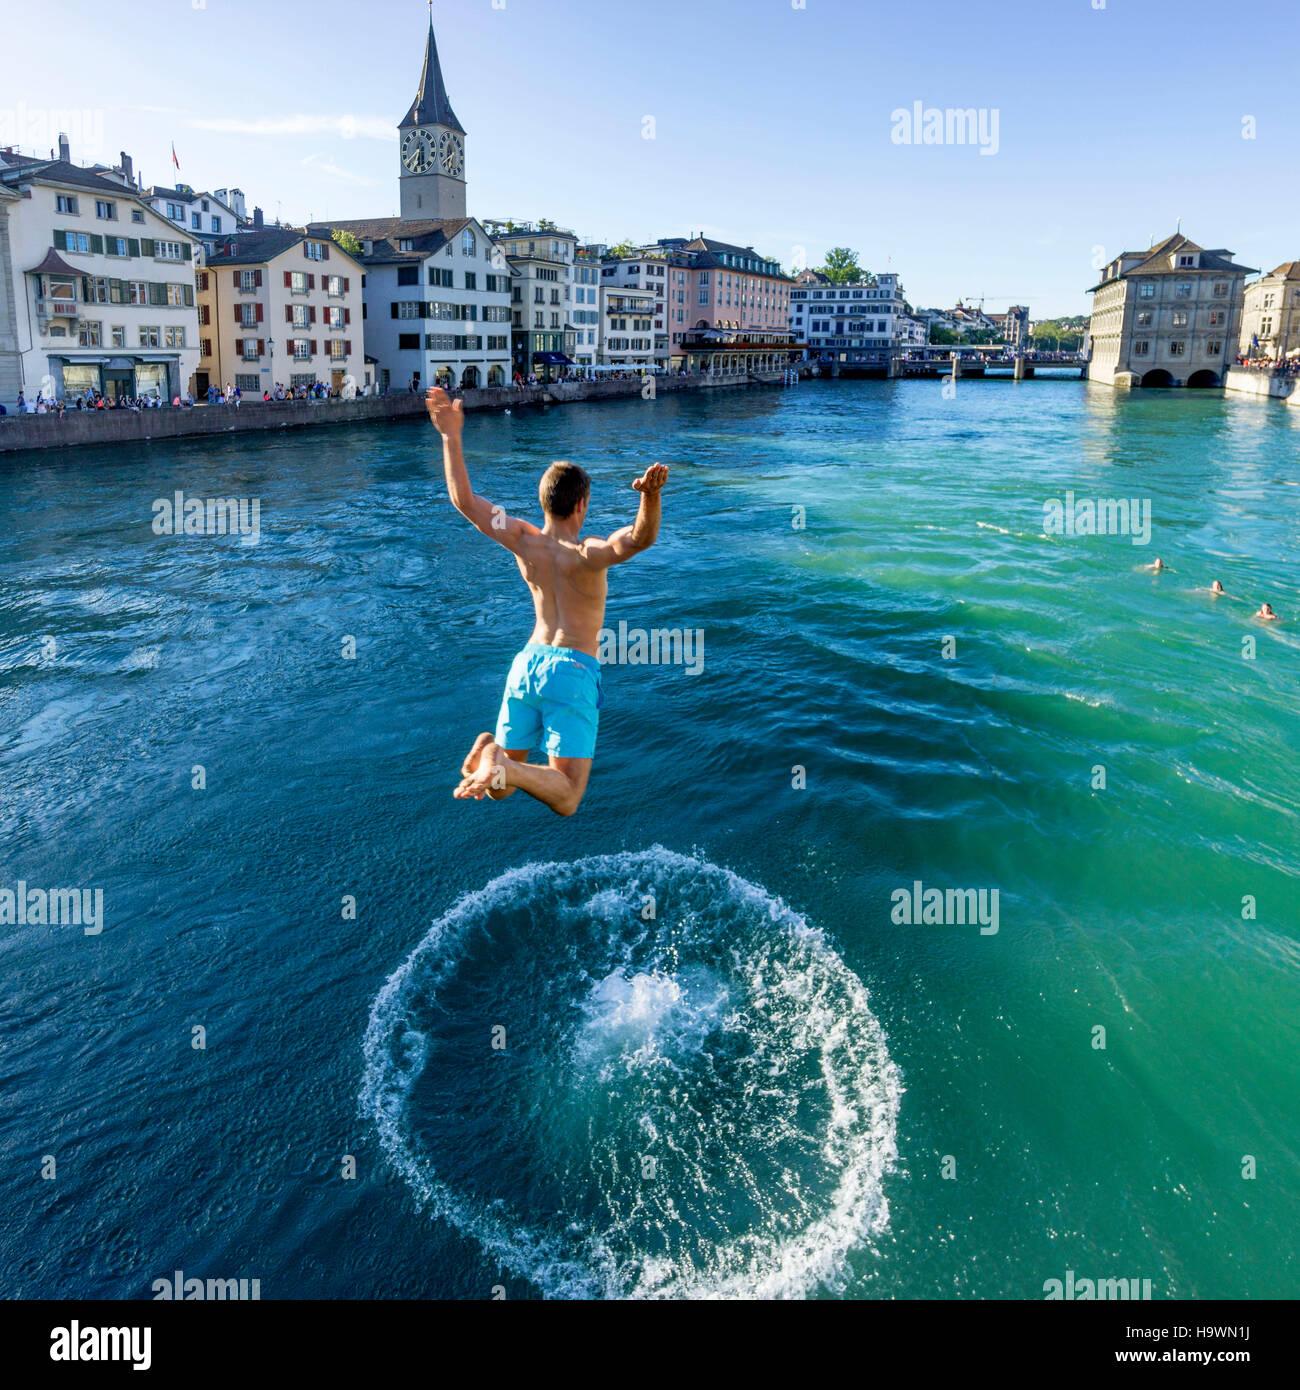 Man jumping into River Limmat, Zurich, Switzerland - Stock Image